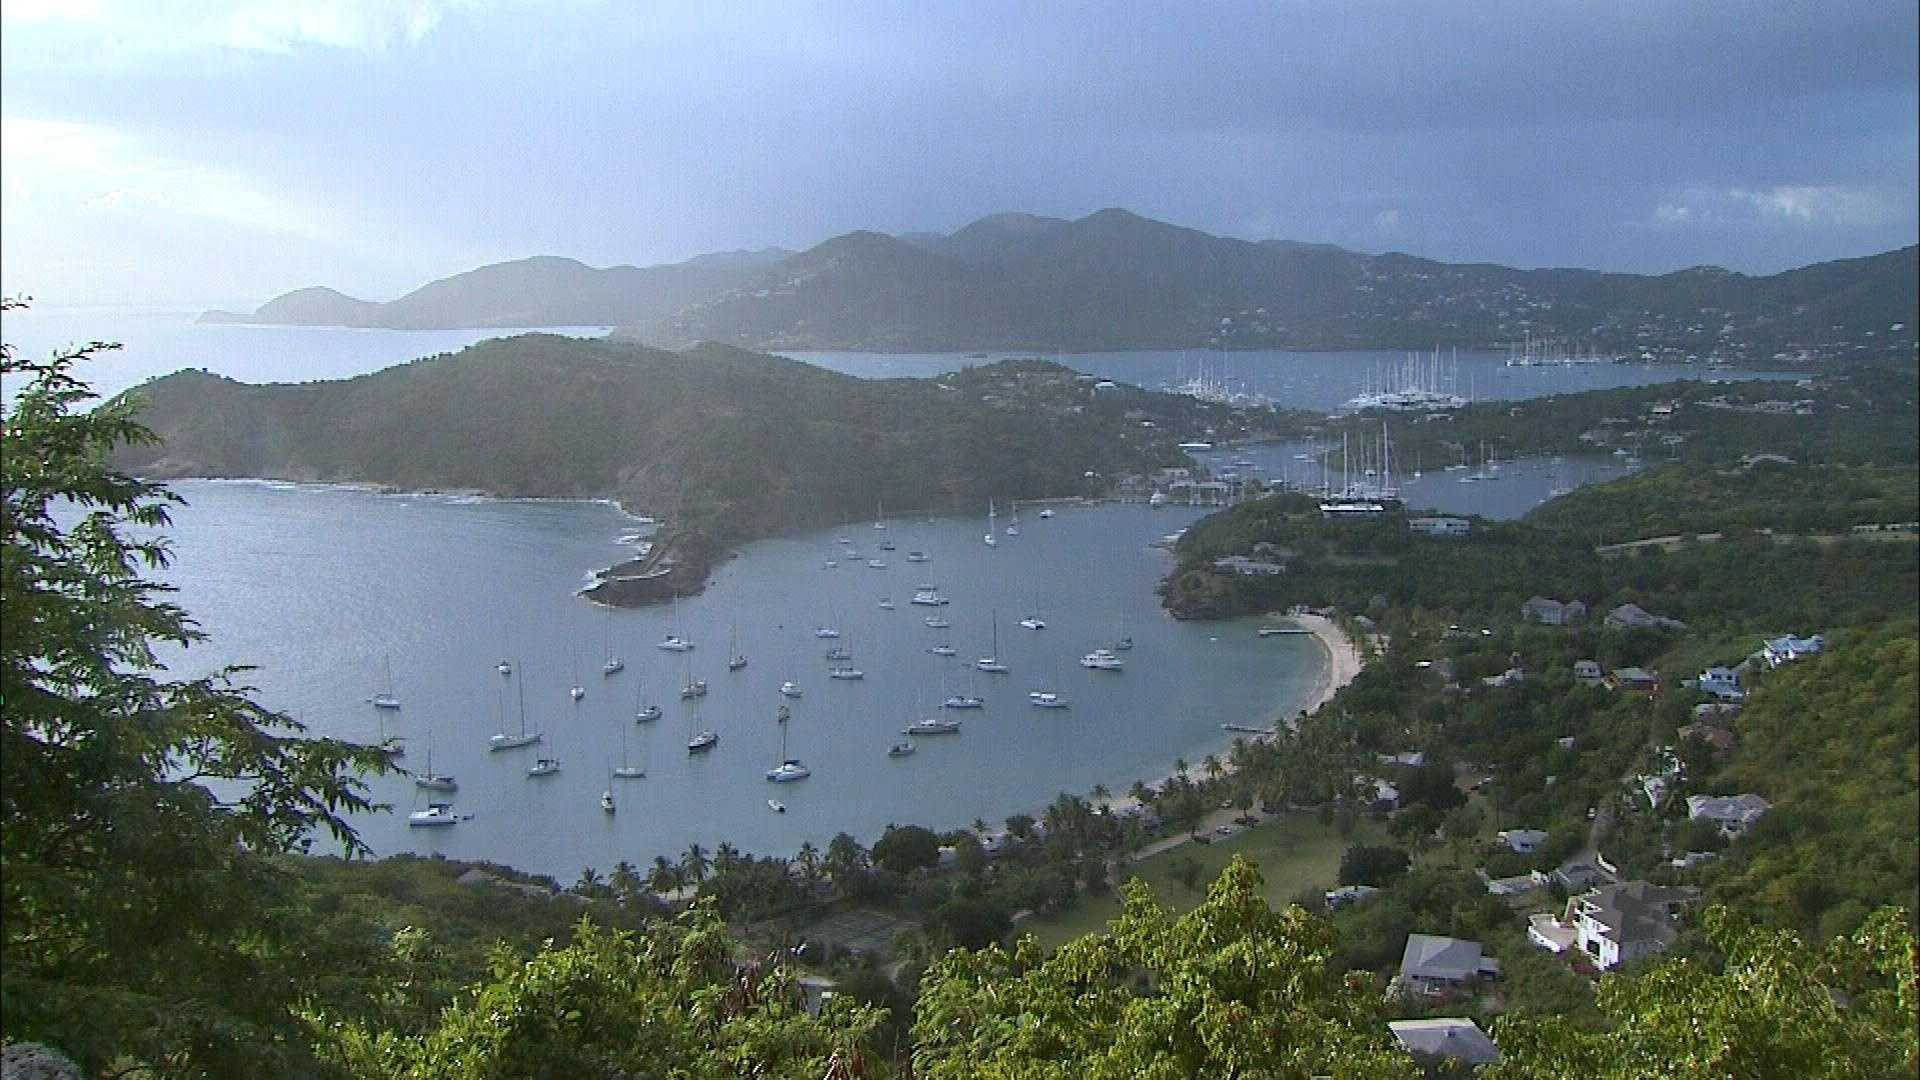 Thursday, January 2: Tropical Travel Tour